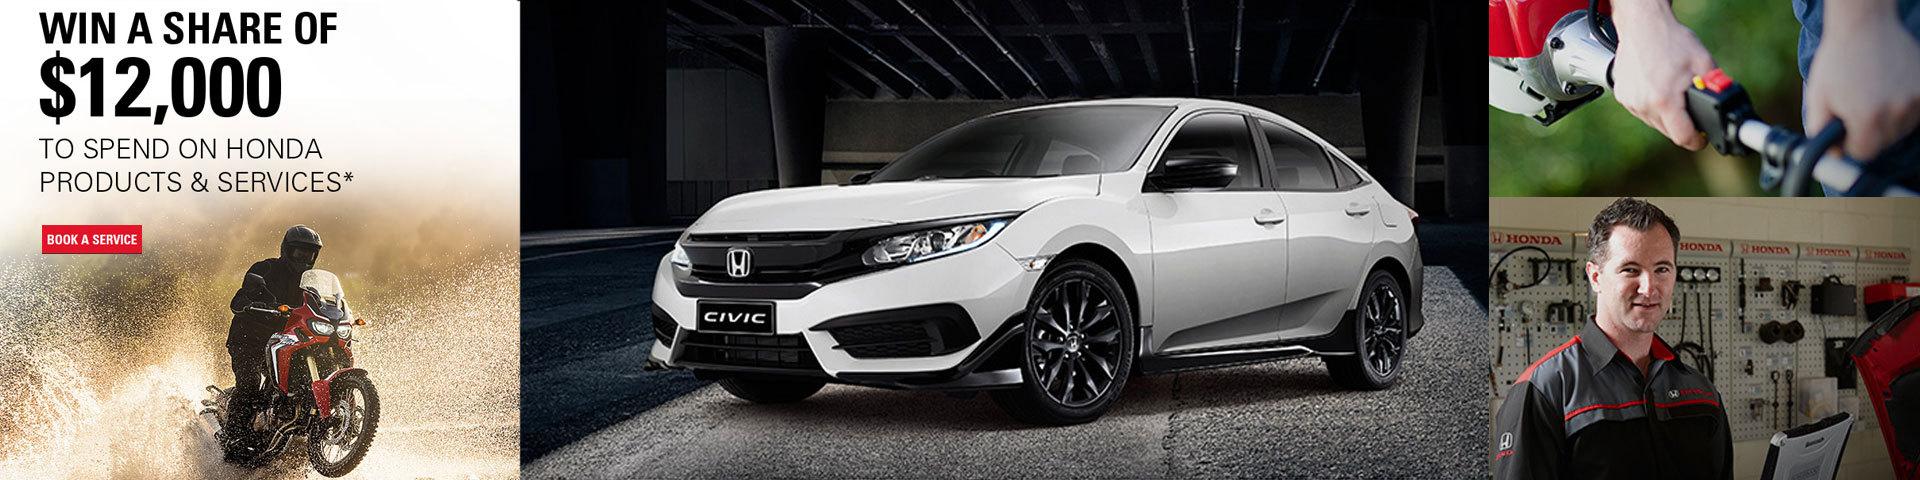 Honda Service Competition